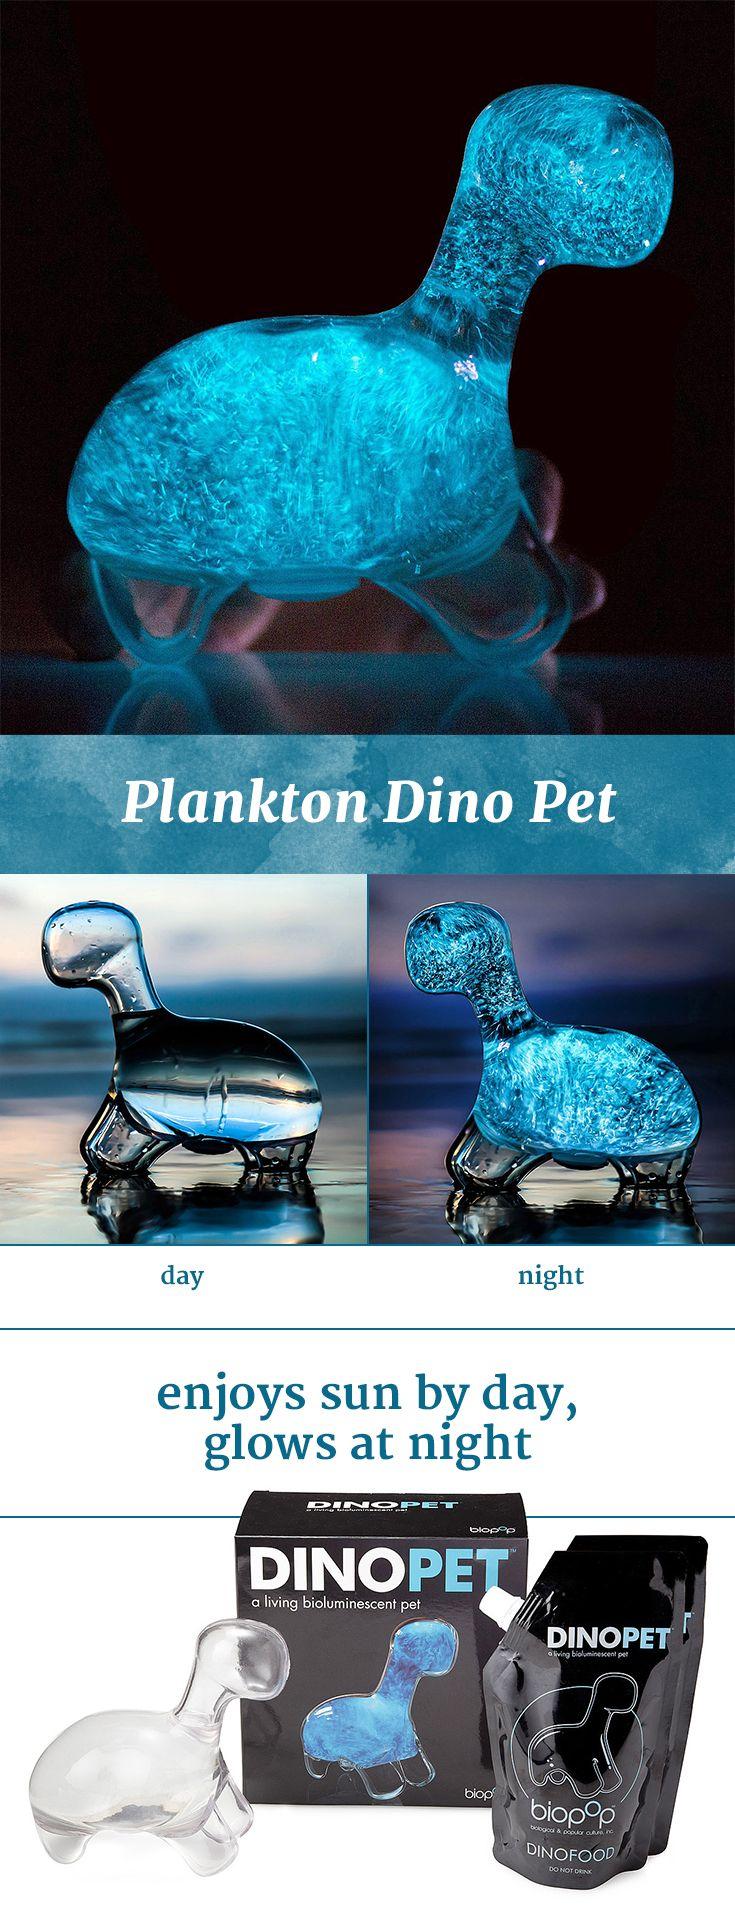 Bioluminescent Dino Pet Stocking Stuffers Cool Gadgets